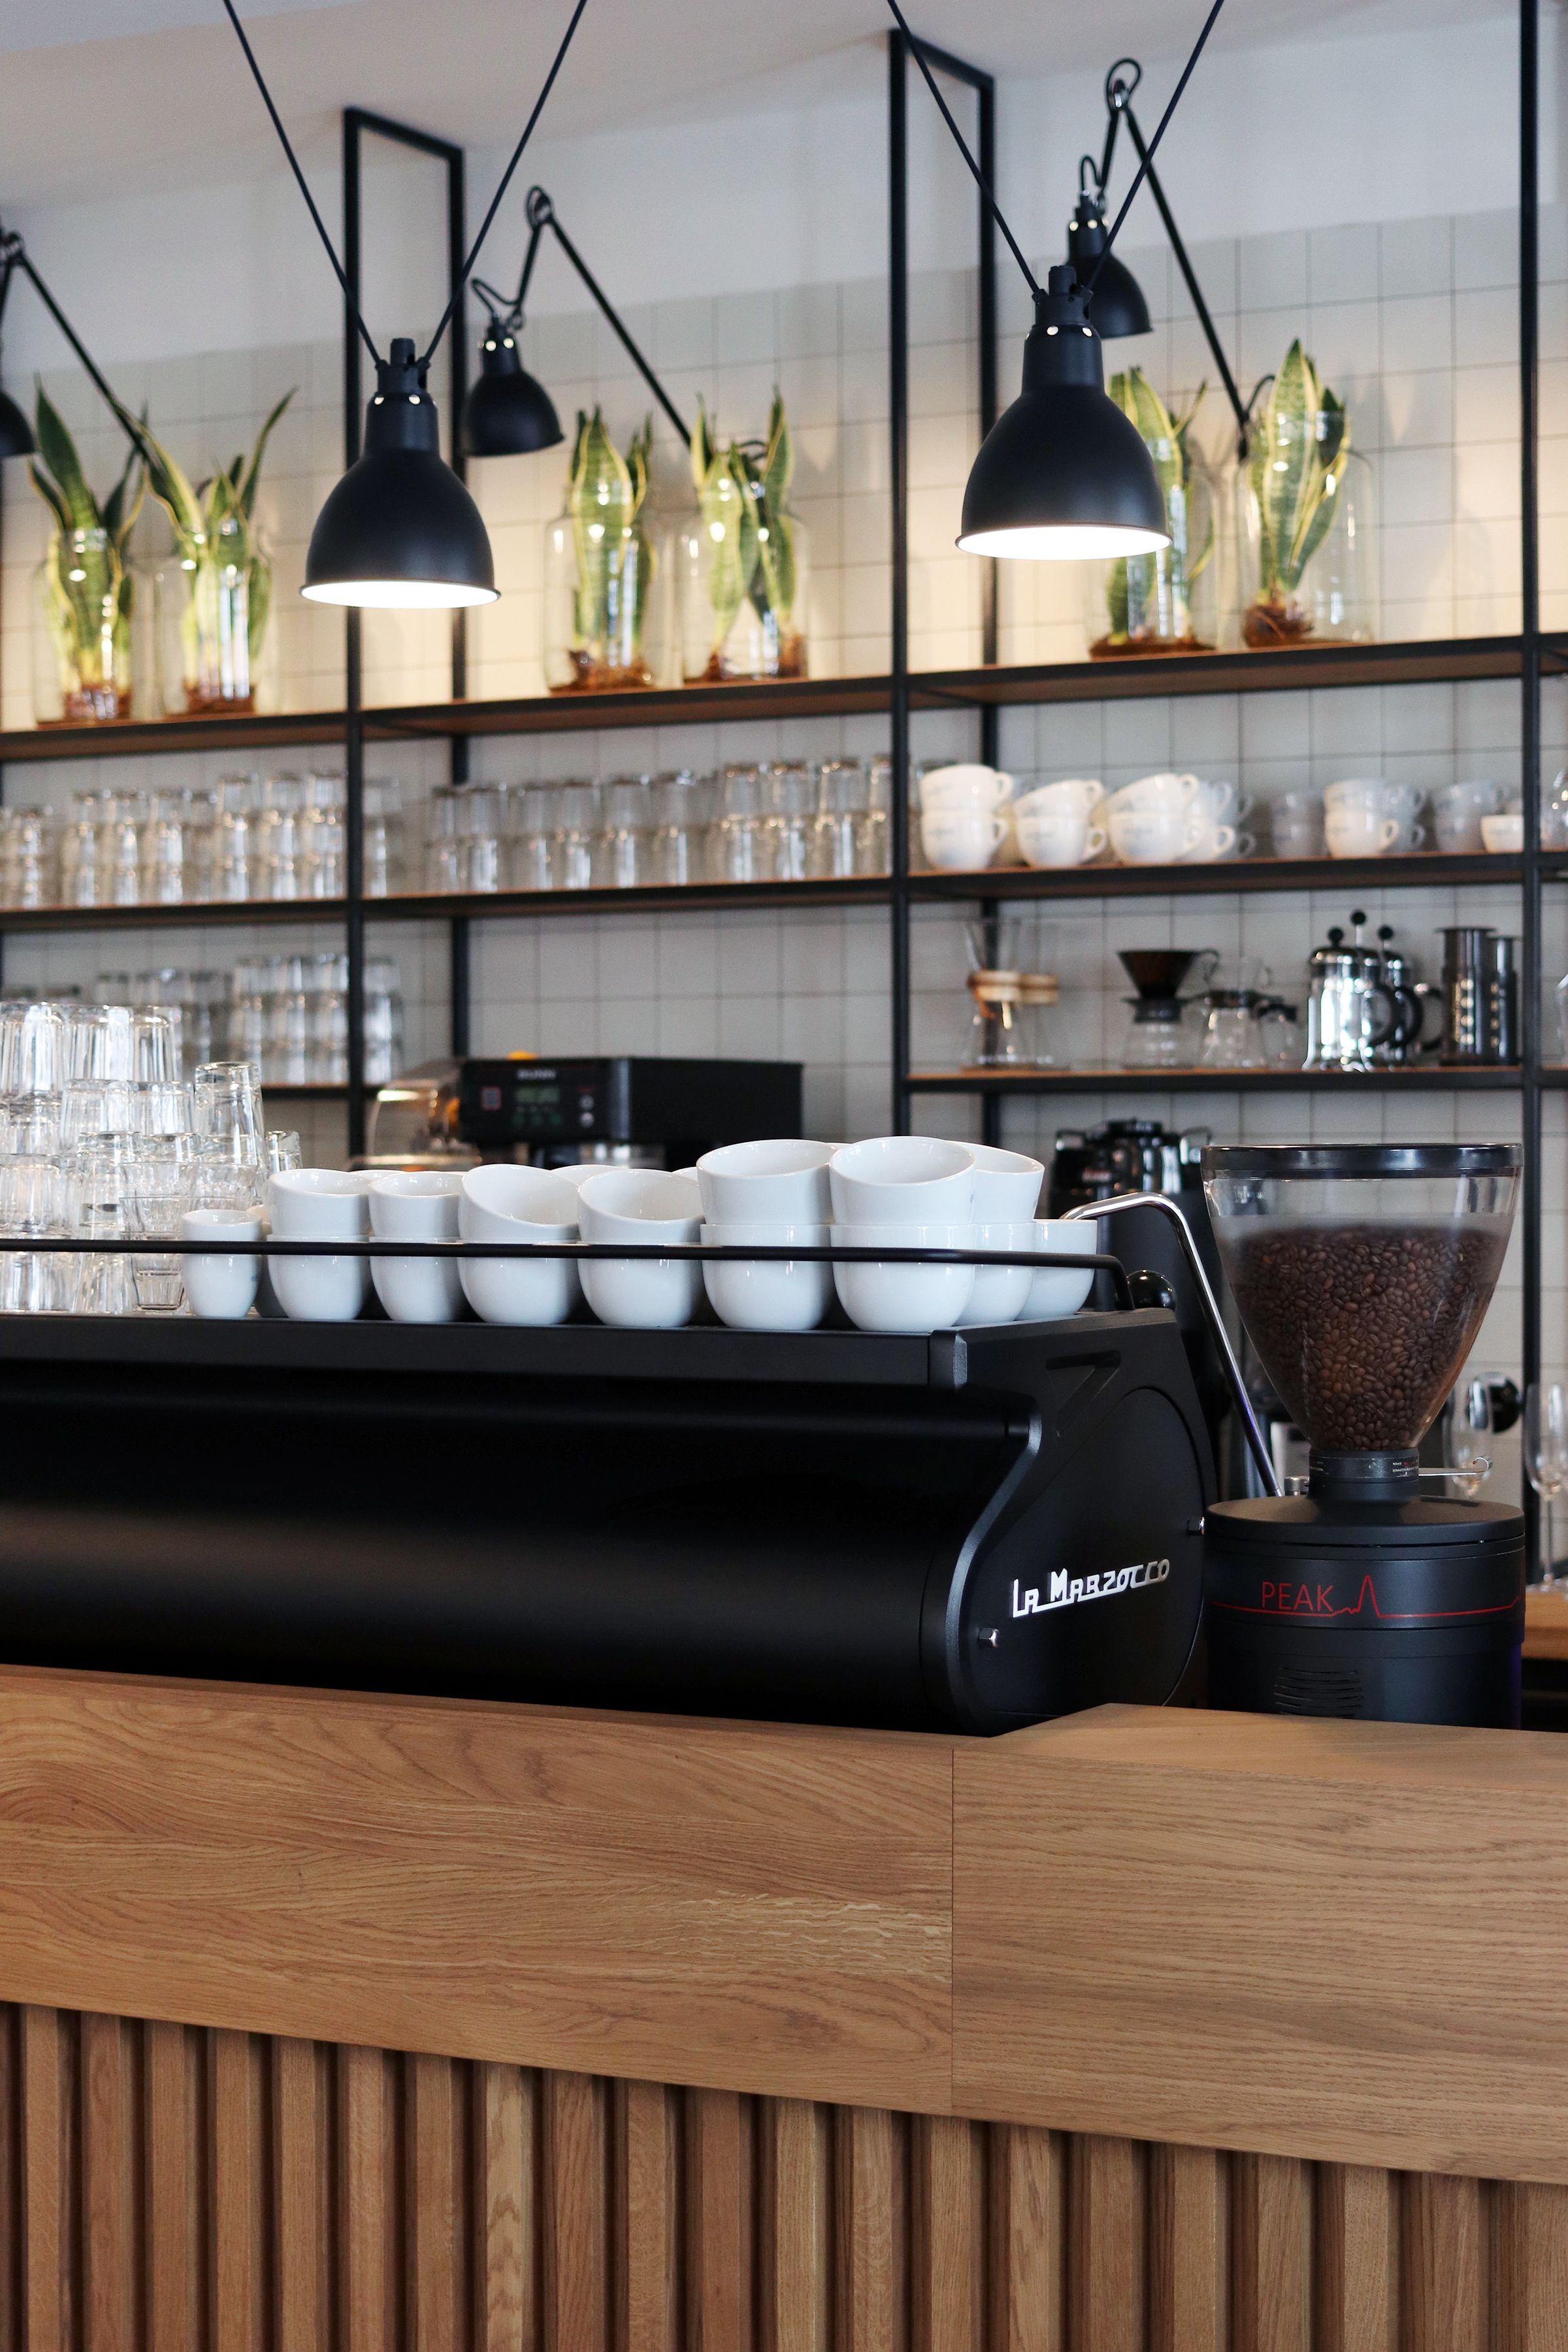 elbgold specialty coffee tolles caf in winterhude m hlenkamp 59 hamburg germany. Black Bedroom Furniture Sets. Home Design Ideas